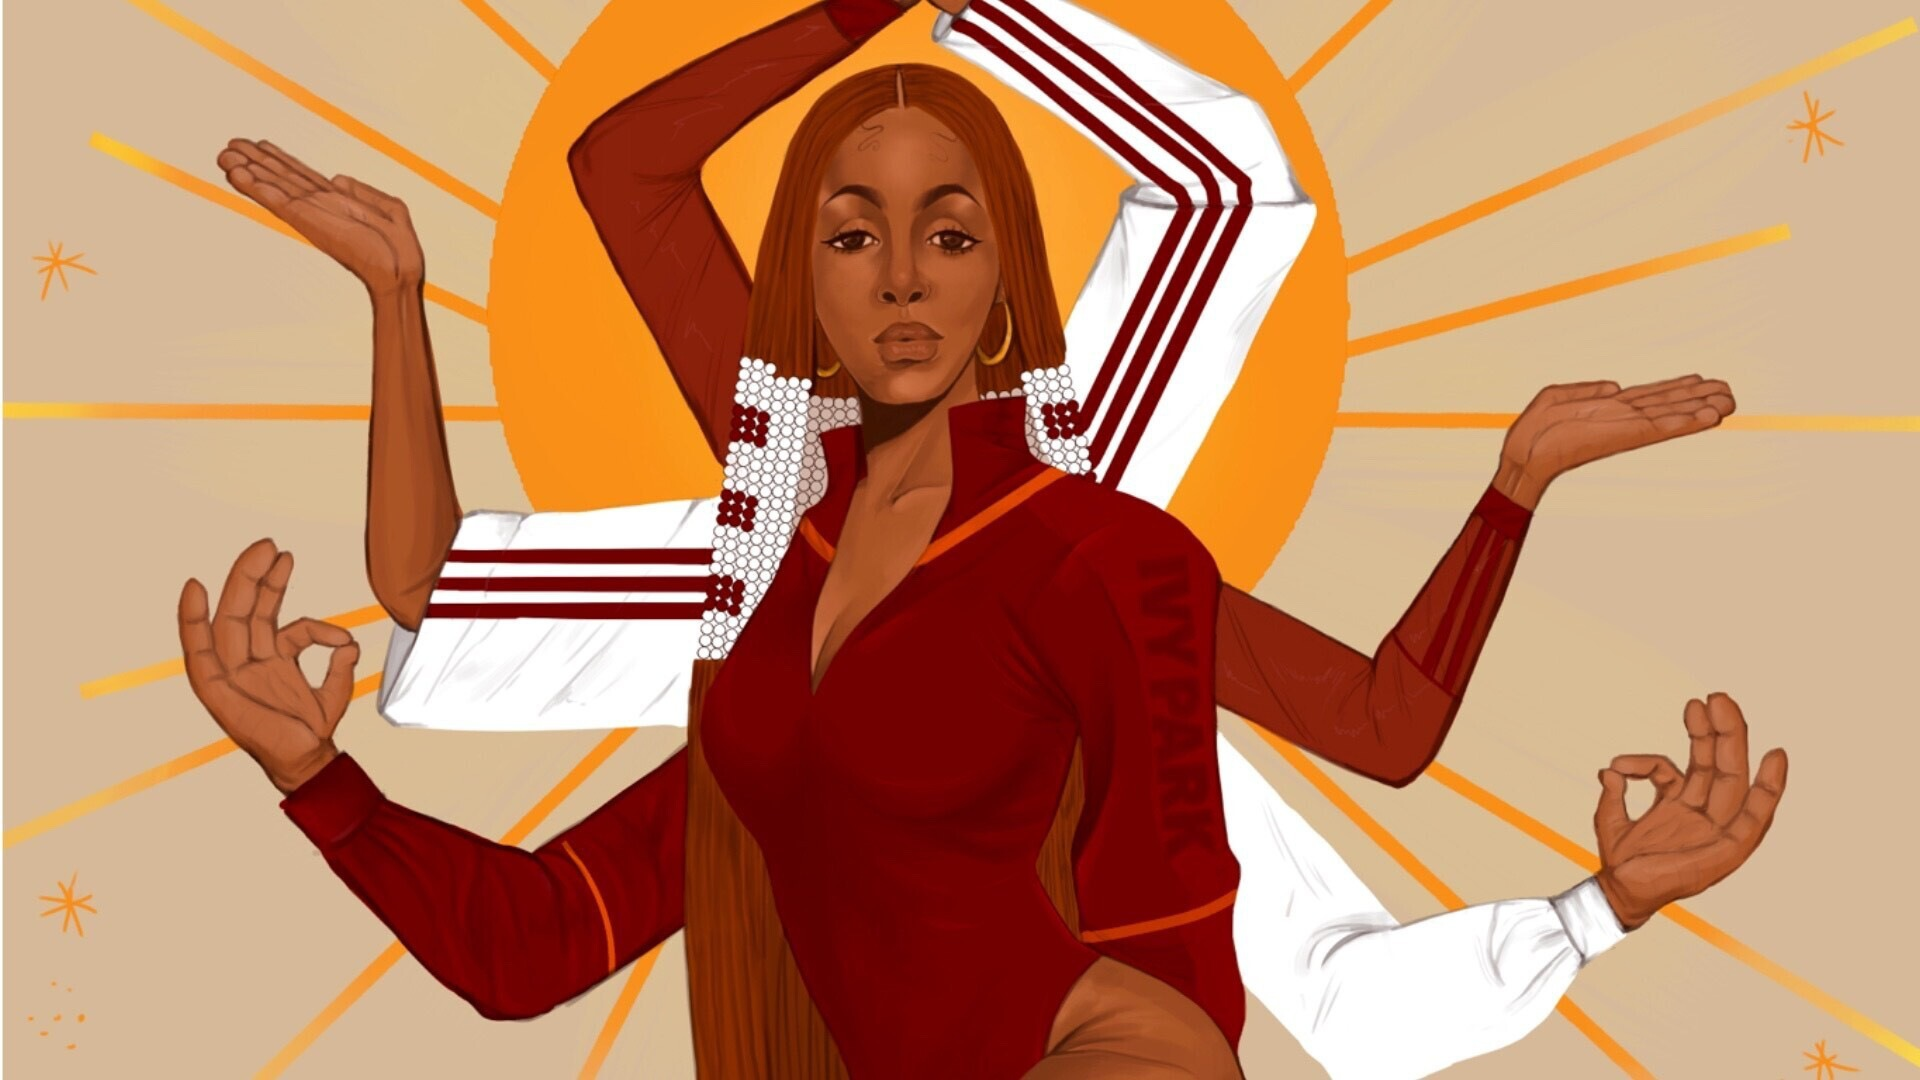 Illustration by Adesewa Adekoya